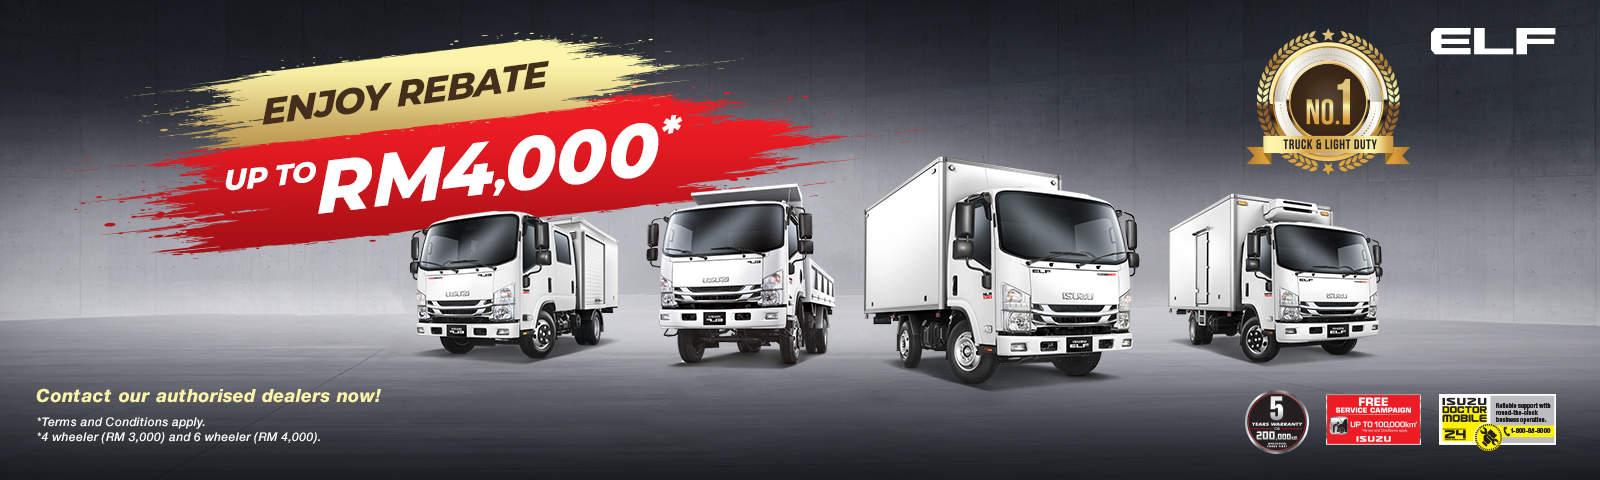 HB_Truck_ElfPromo_02